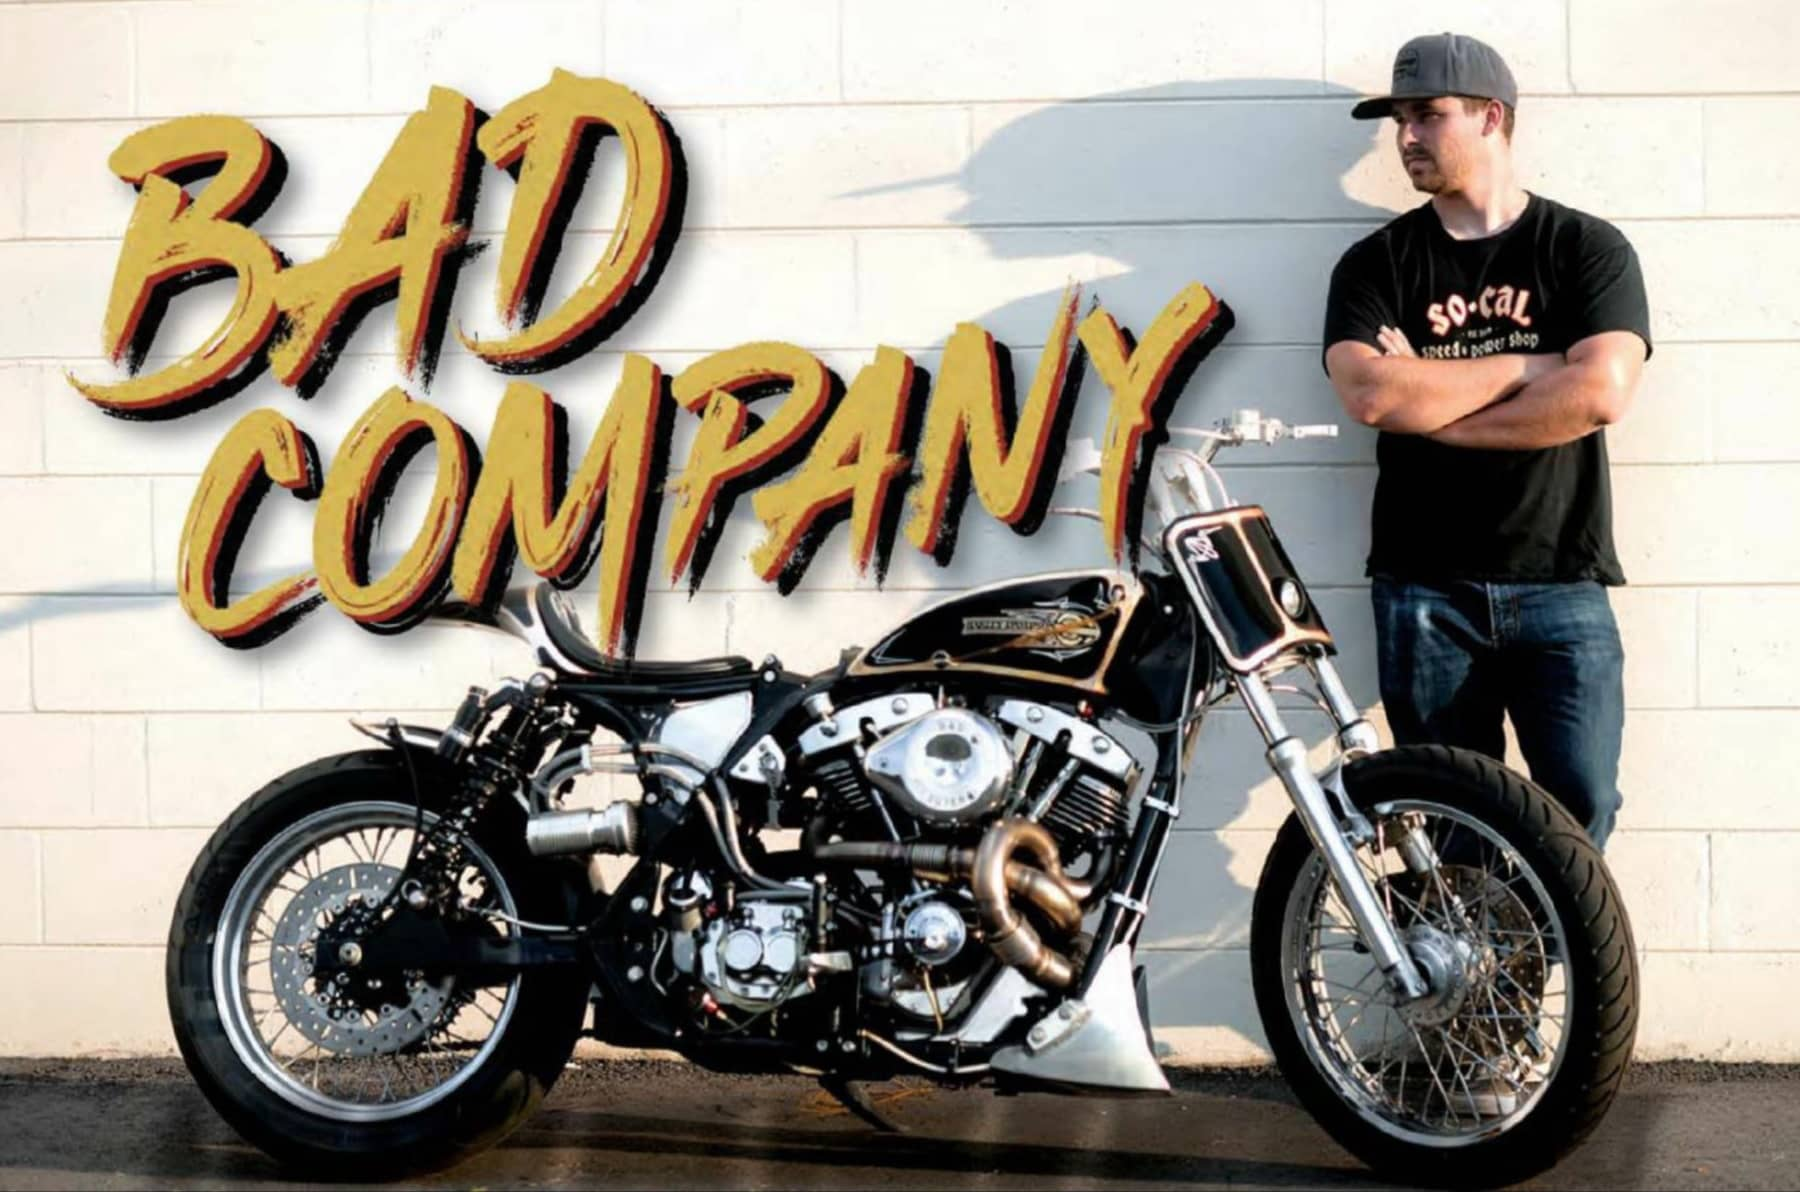 BAD COMPANY - A KYLE RAY RICE WORK OF MOTORIZED ART